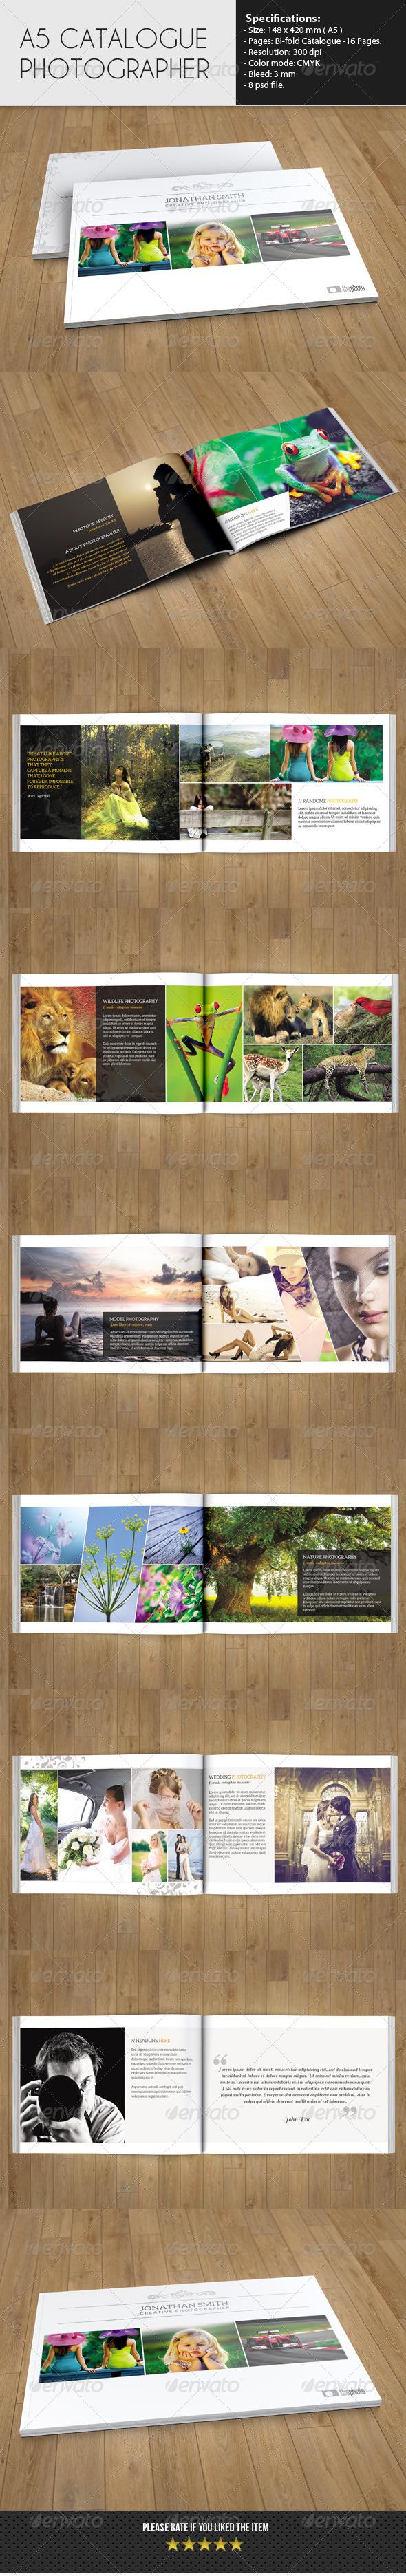 GraphicRiver Bifold Catalog Photographer 6449675